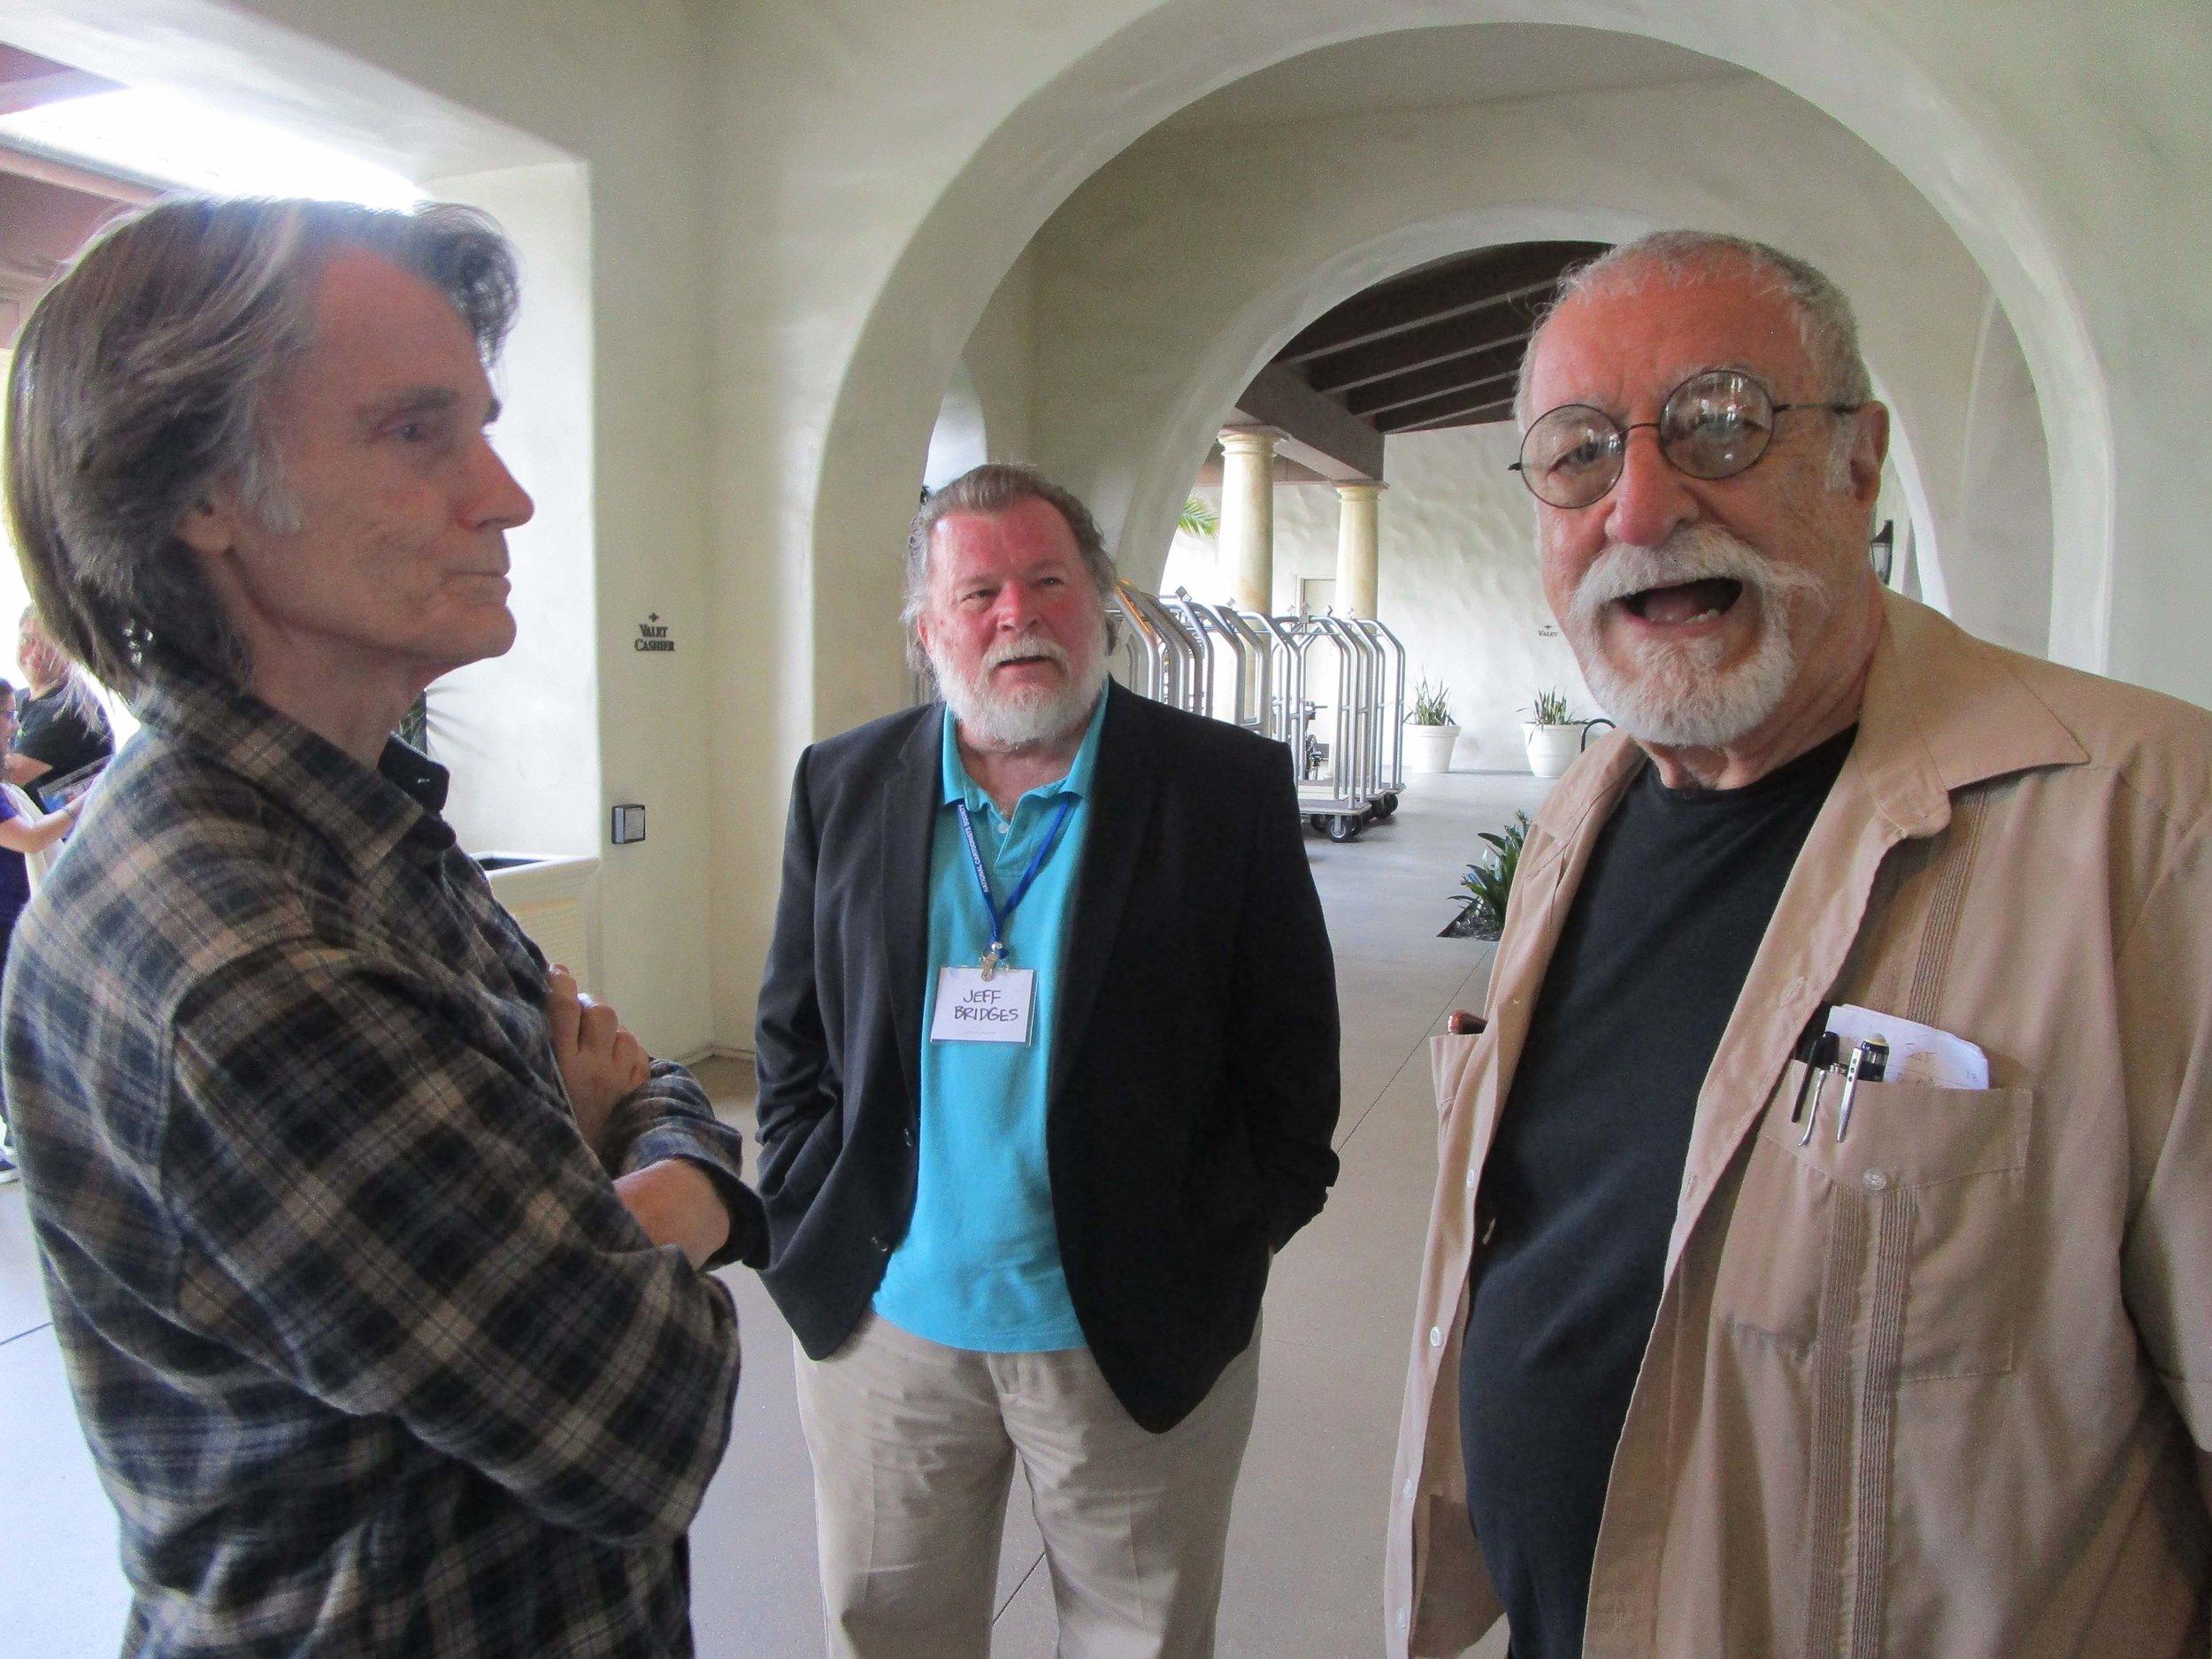 Greg Evans, Jack Pittman and Sergio Aragones (l-r)